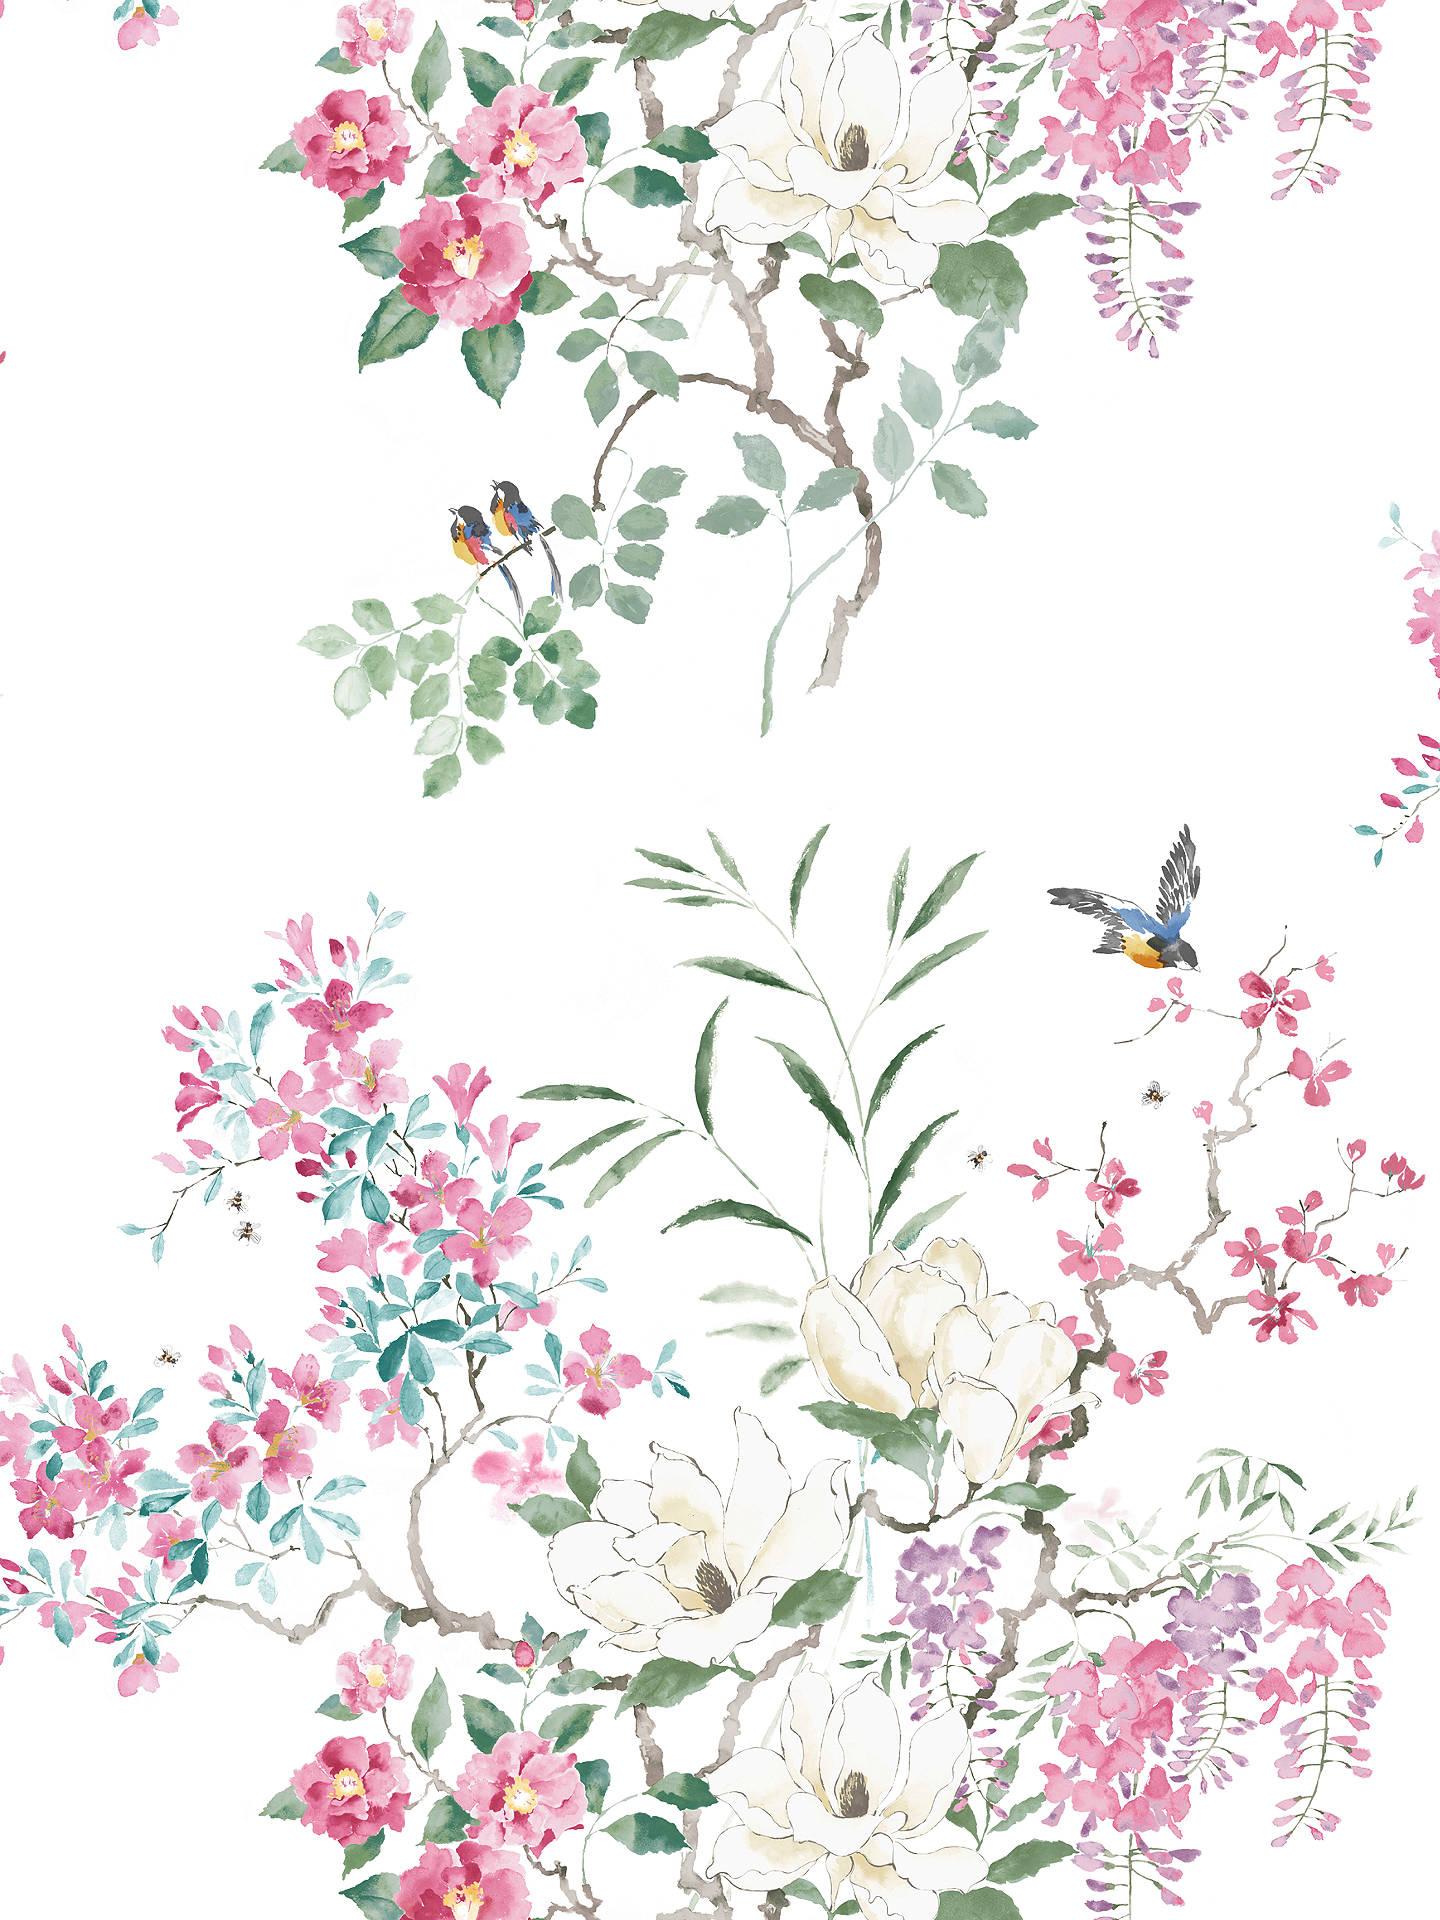 Buy Sanderson Waterperry Magnolia Wallpaper 216306, Panel B Online at johnlewis.com ...